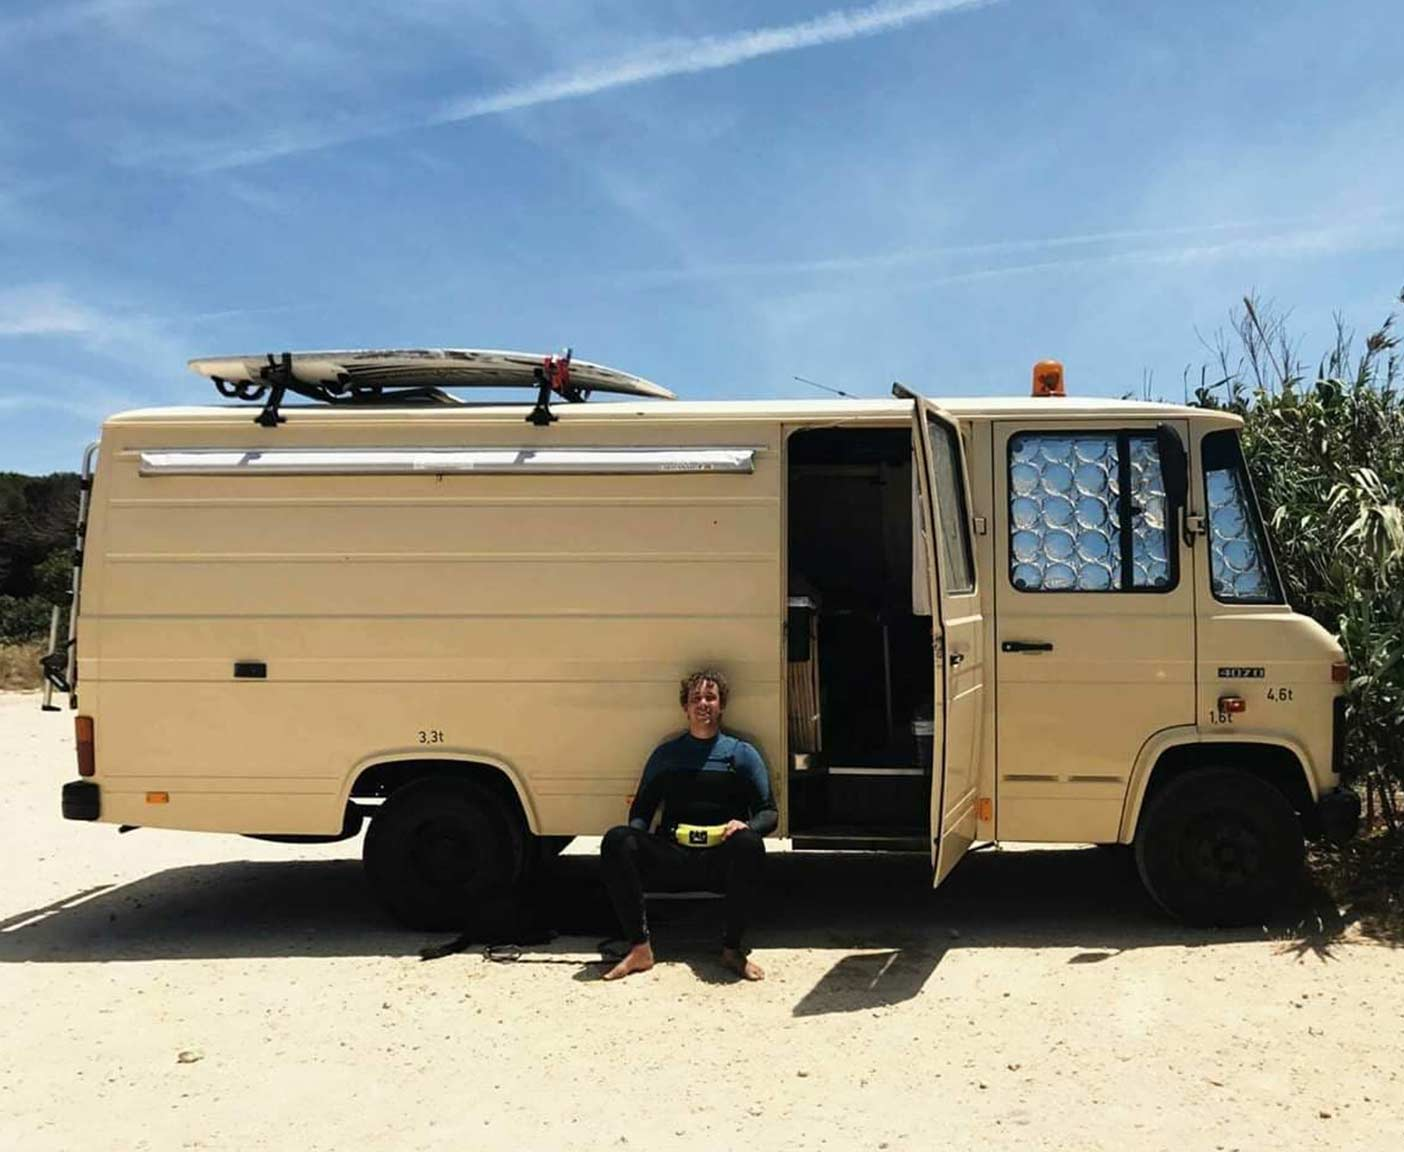 mercedes-407d-long-version-vanlife-duedo-van-conversion-interoir-inside